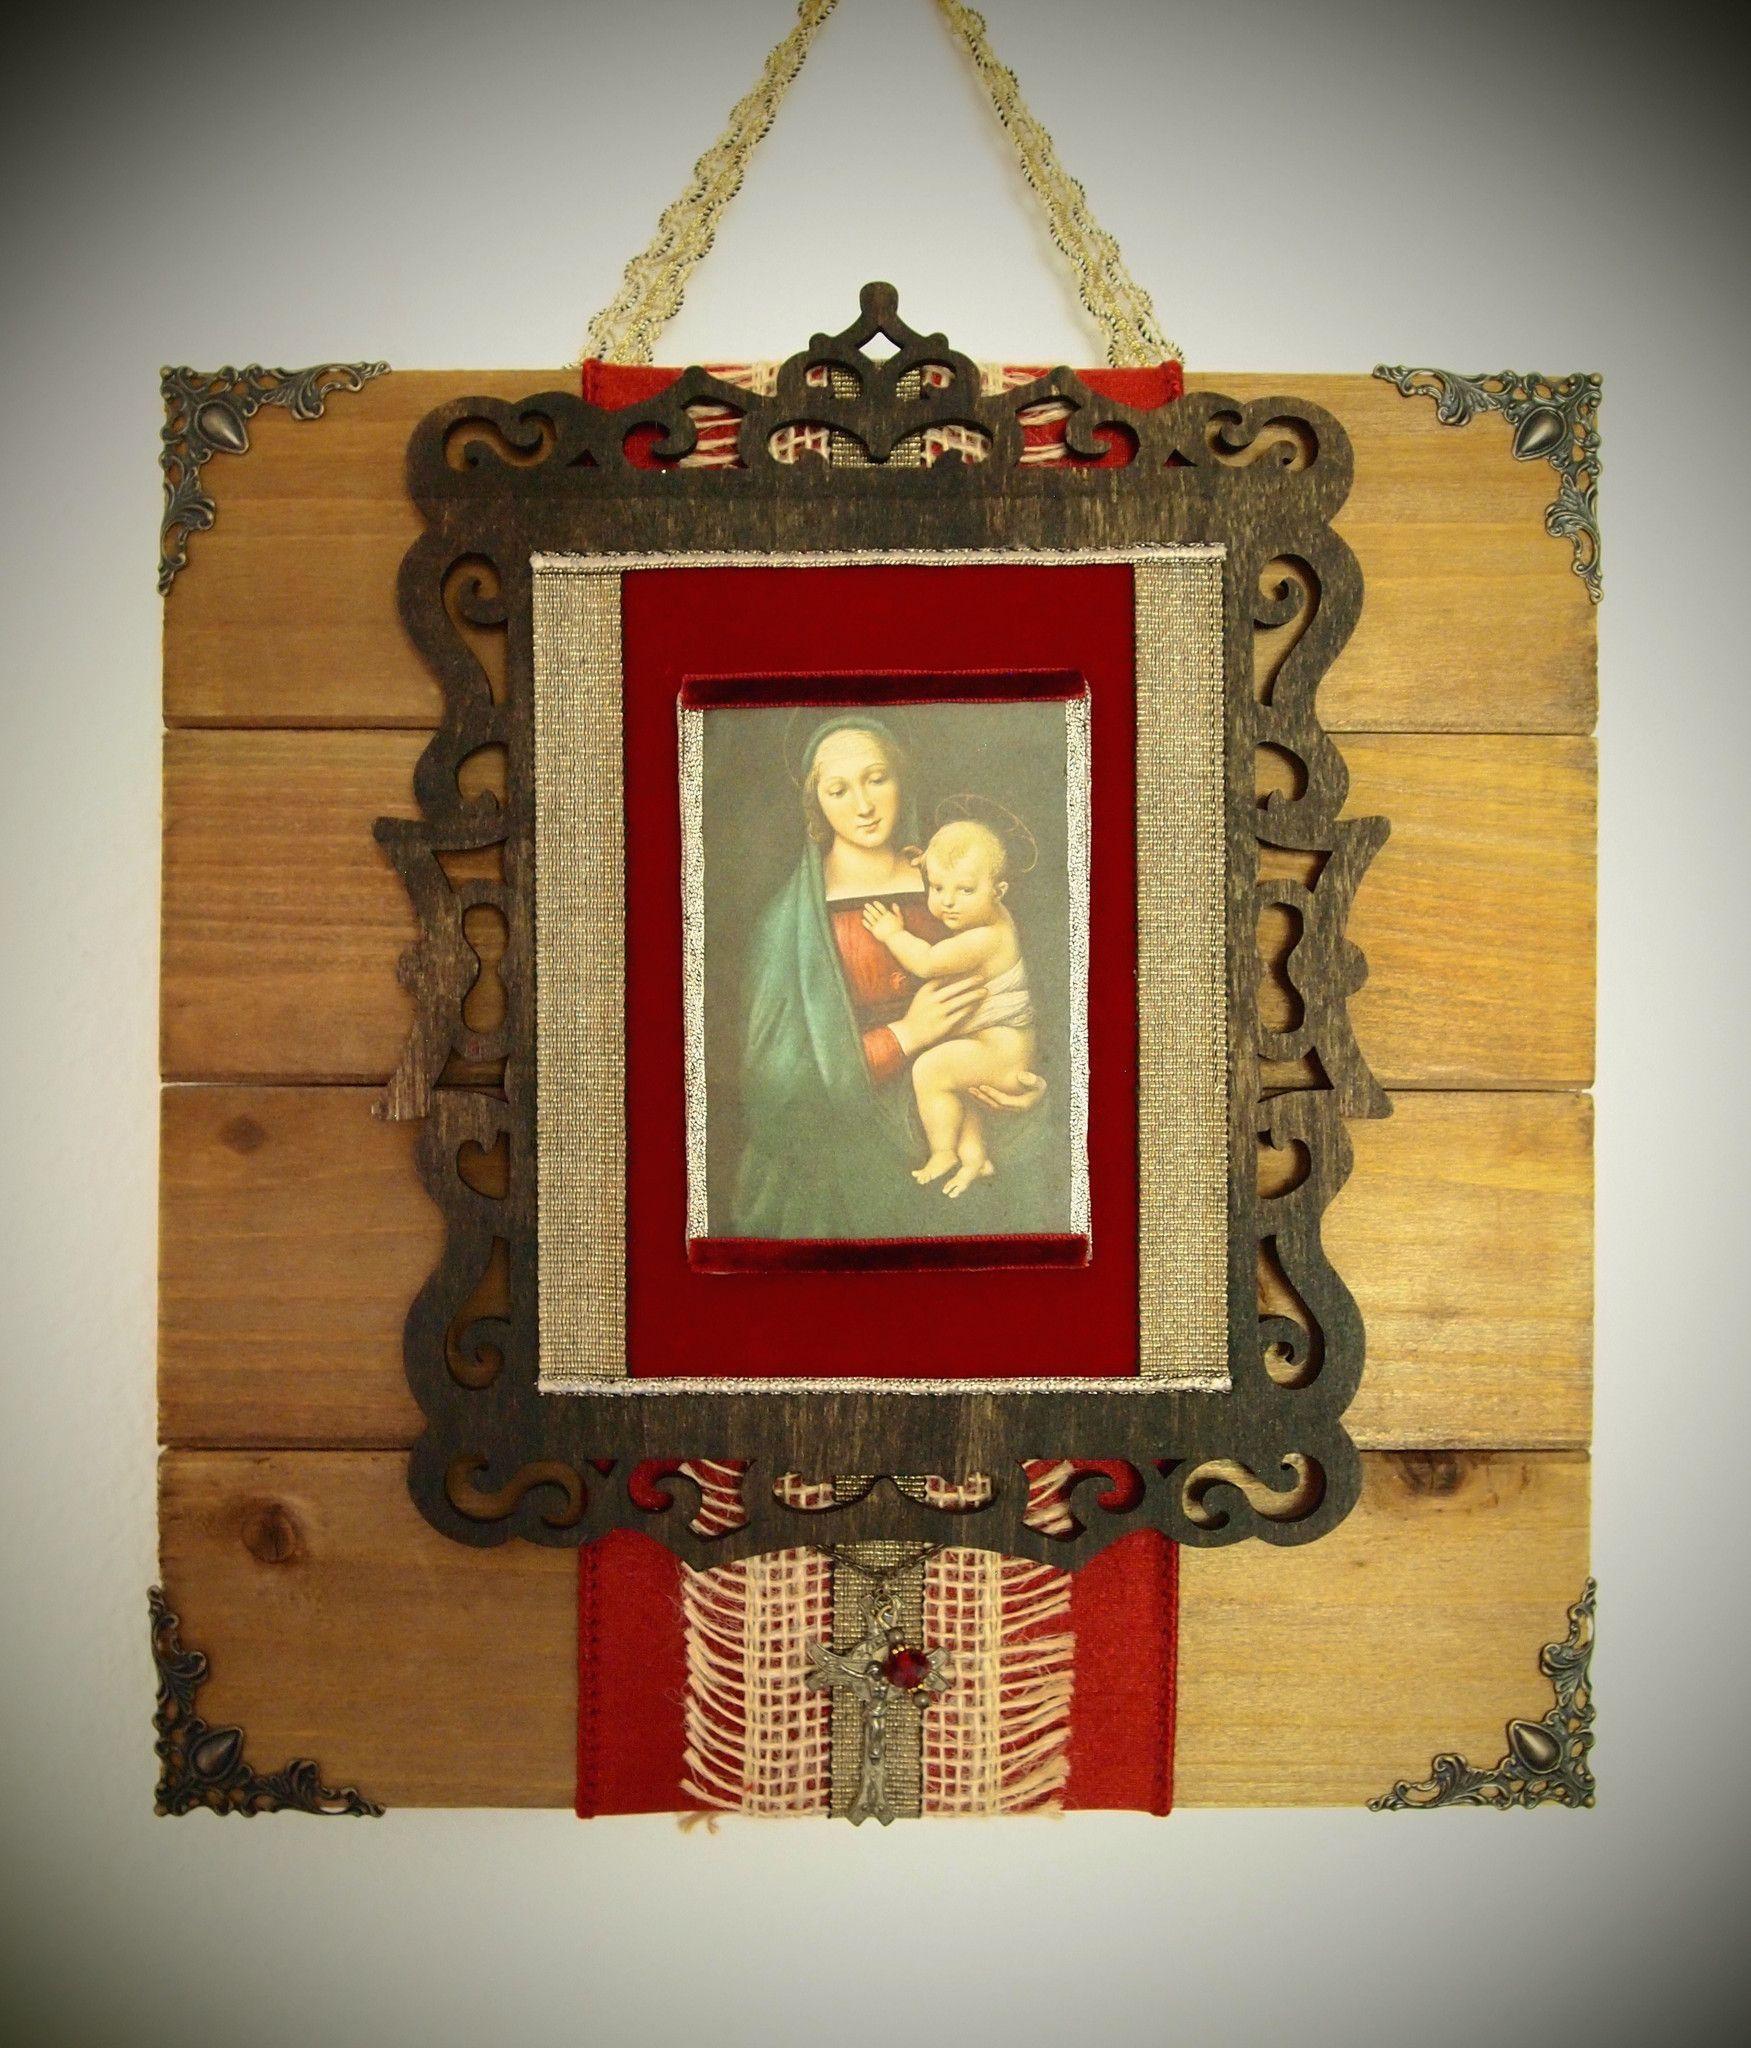 Virgin mary rustic wall art vintage catholic decor u gifts